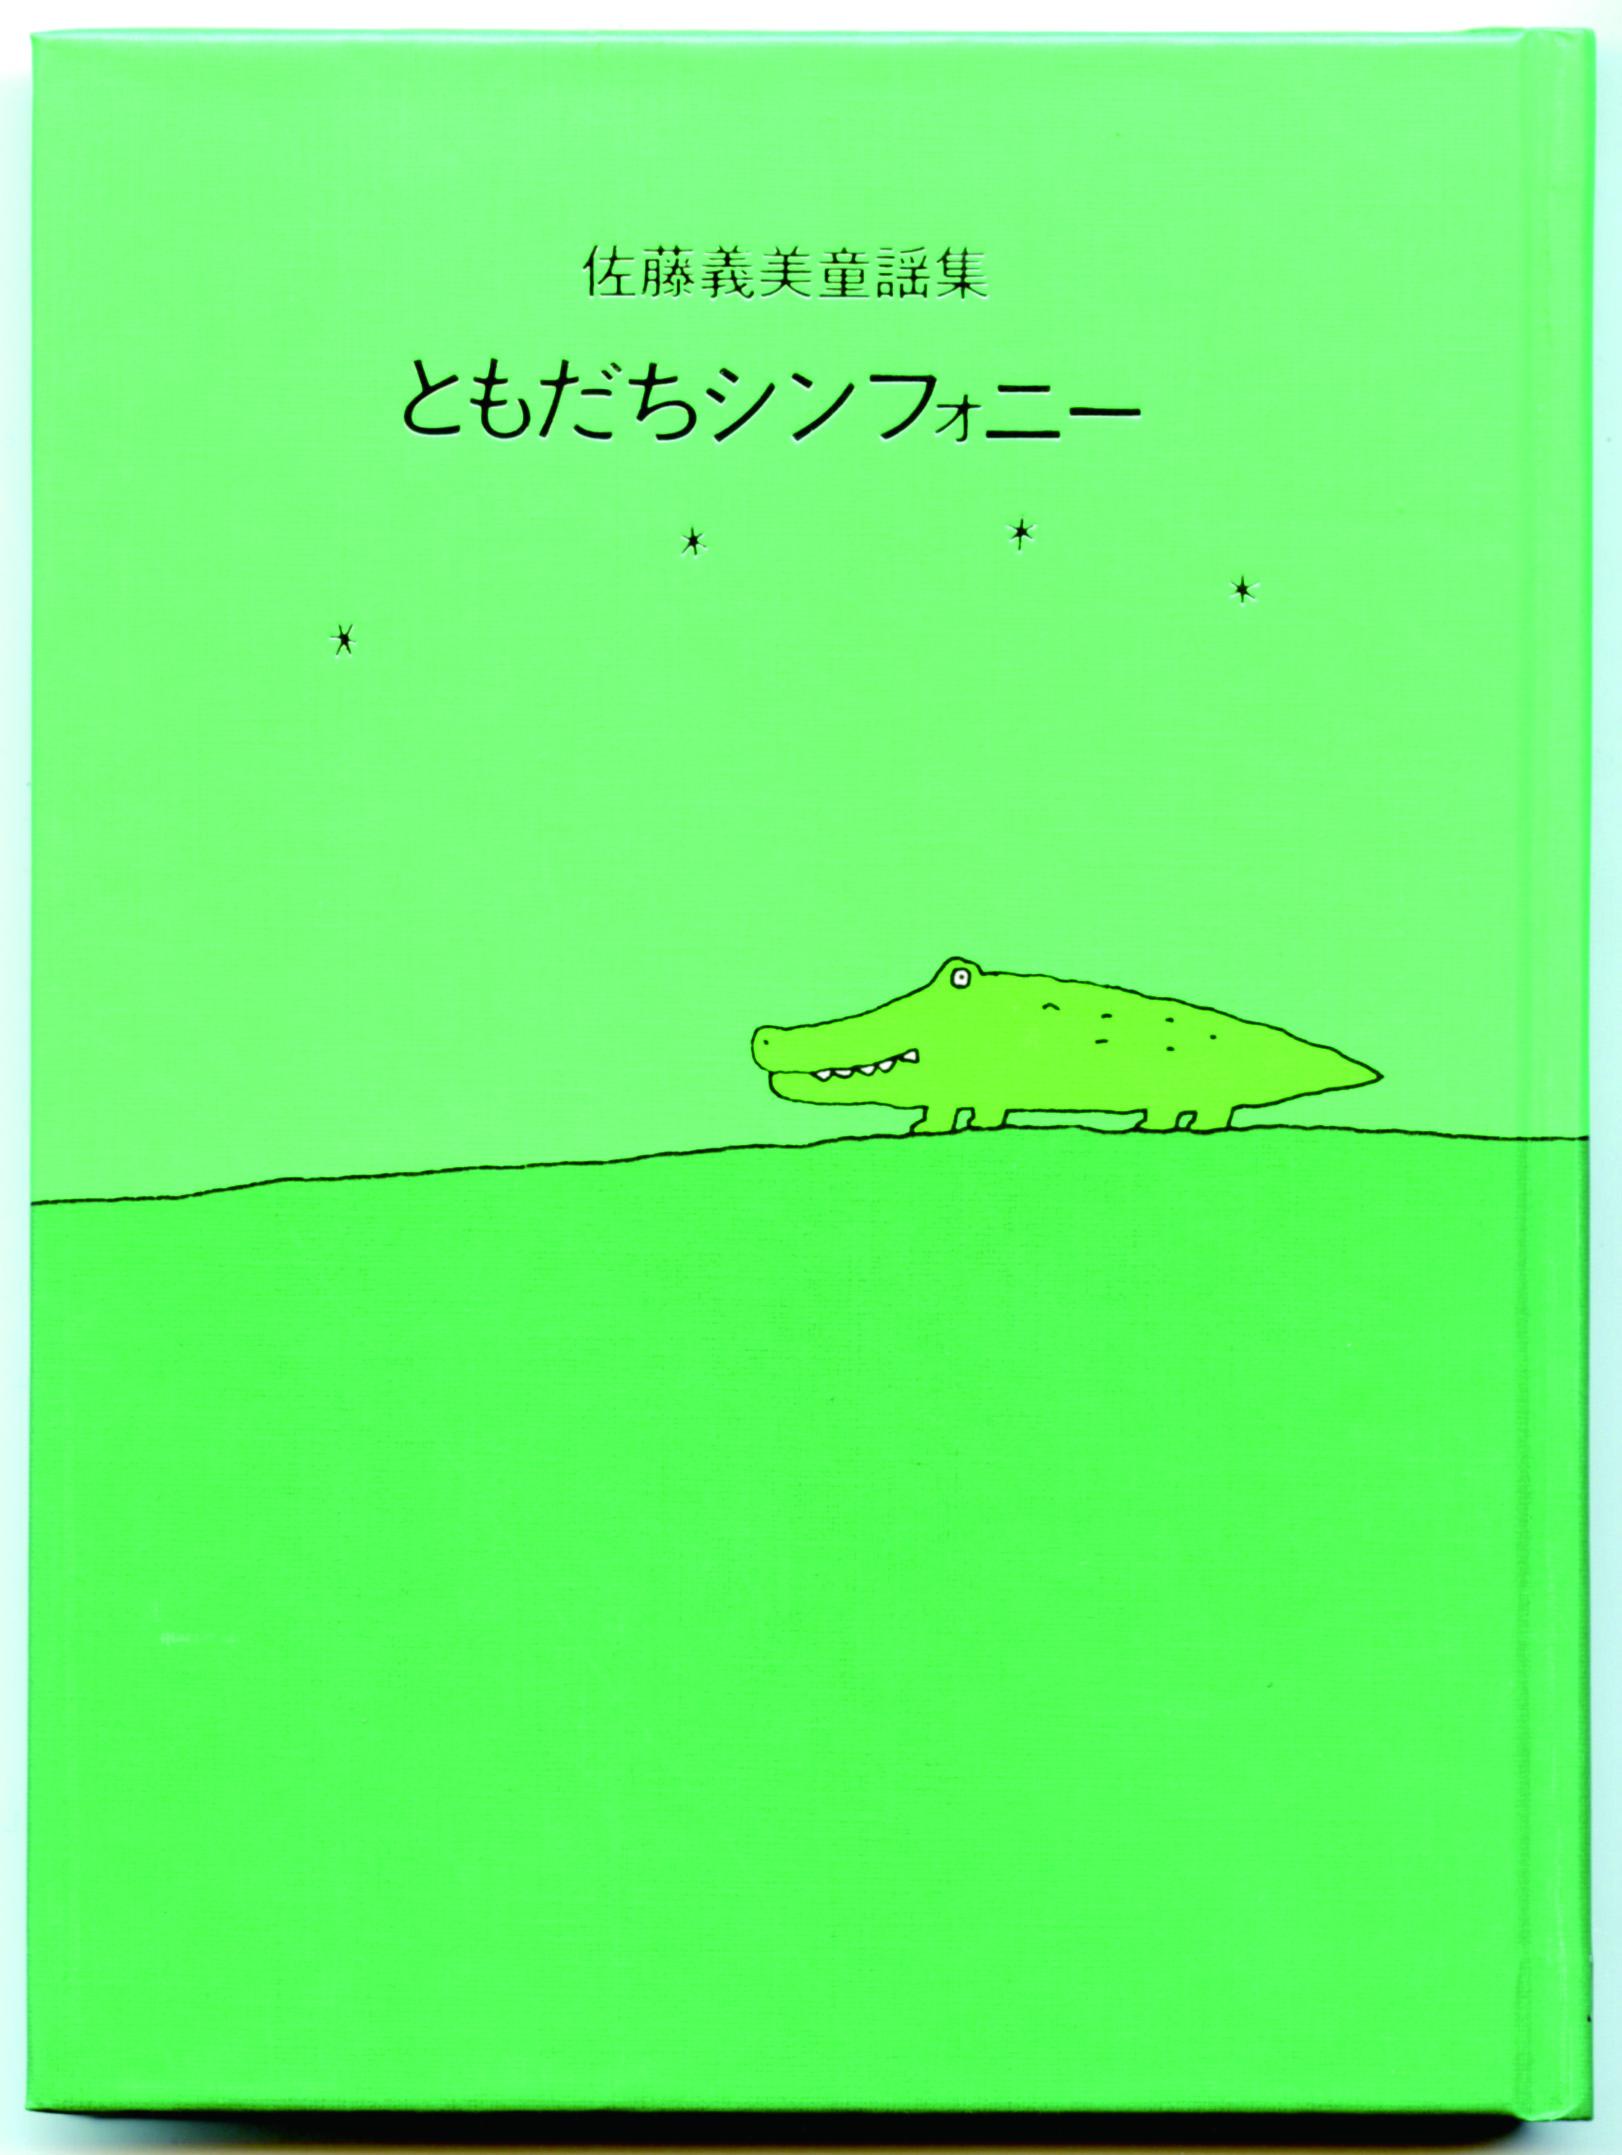 tomodachi.jpg